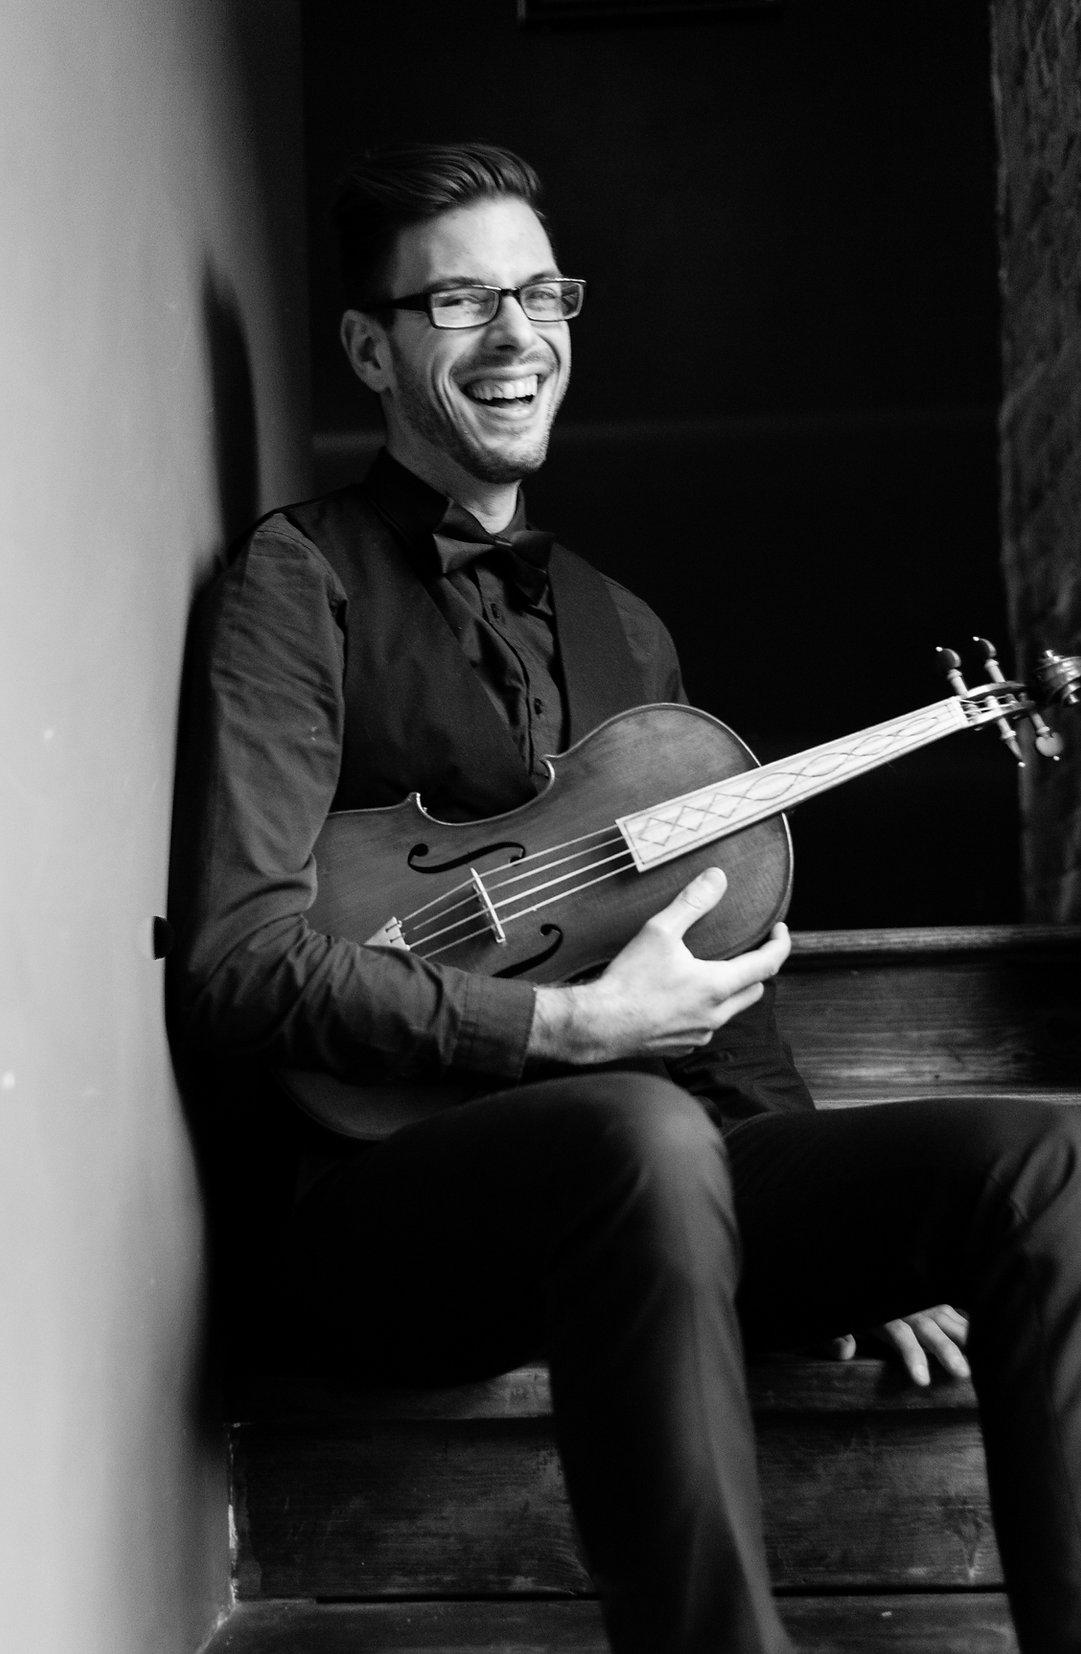 Michael Hill viola, Baroque viola, Louisville viola, Louisville classical music